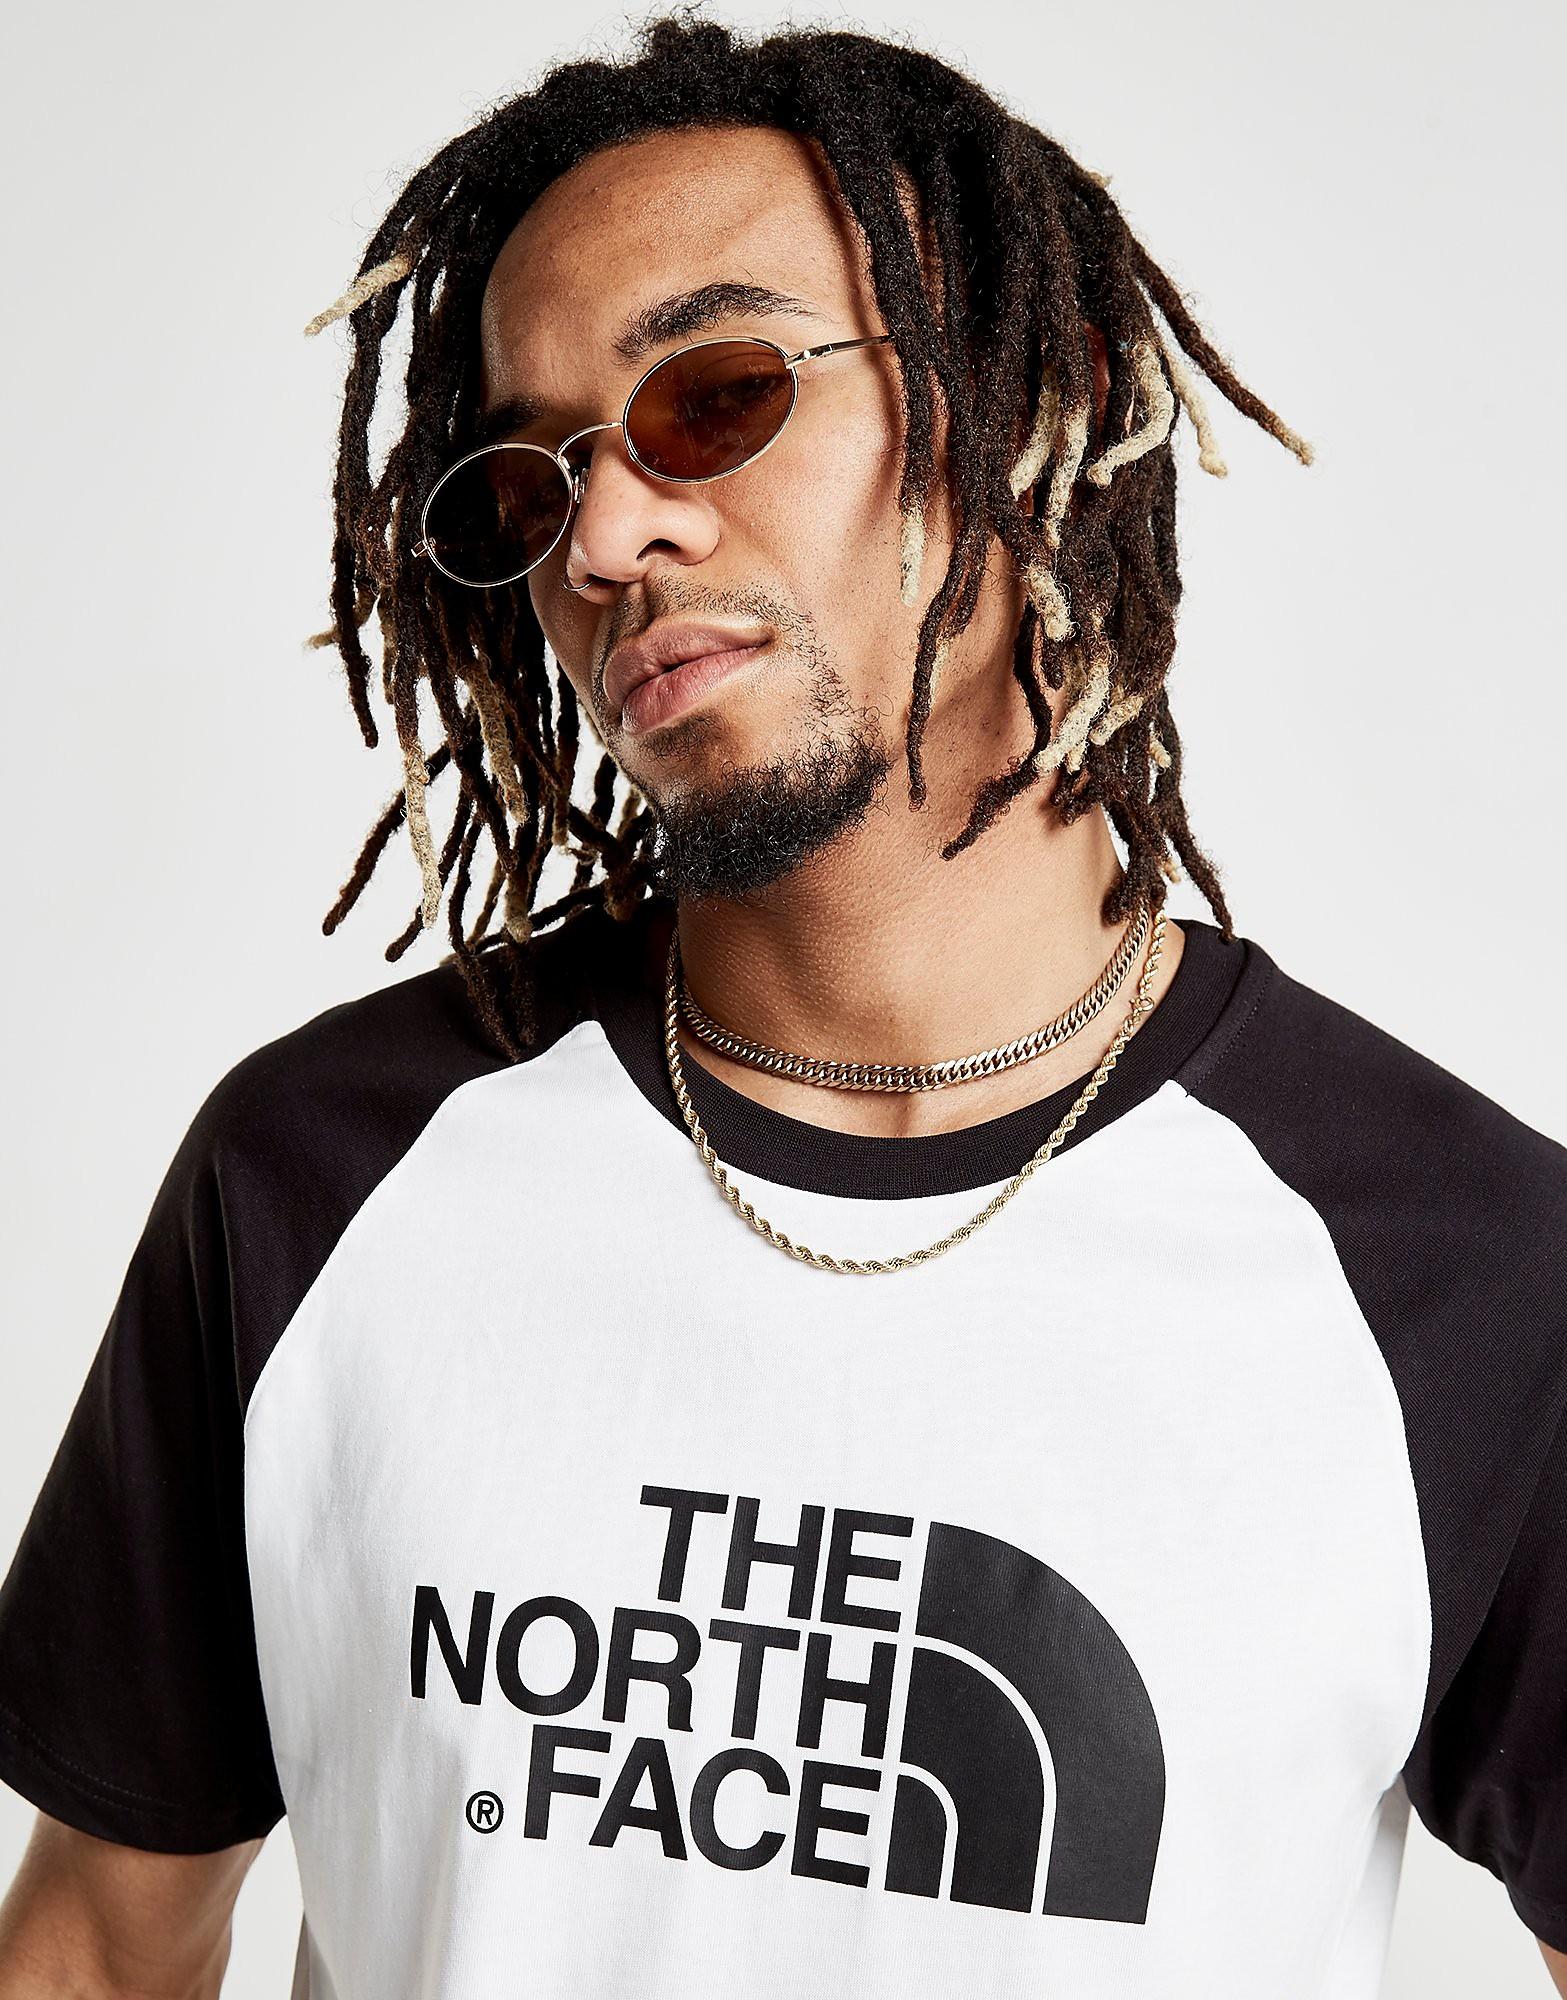 The North Face Raglan T-Shirt